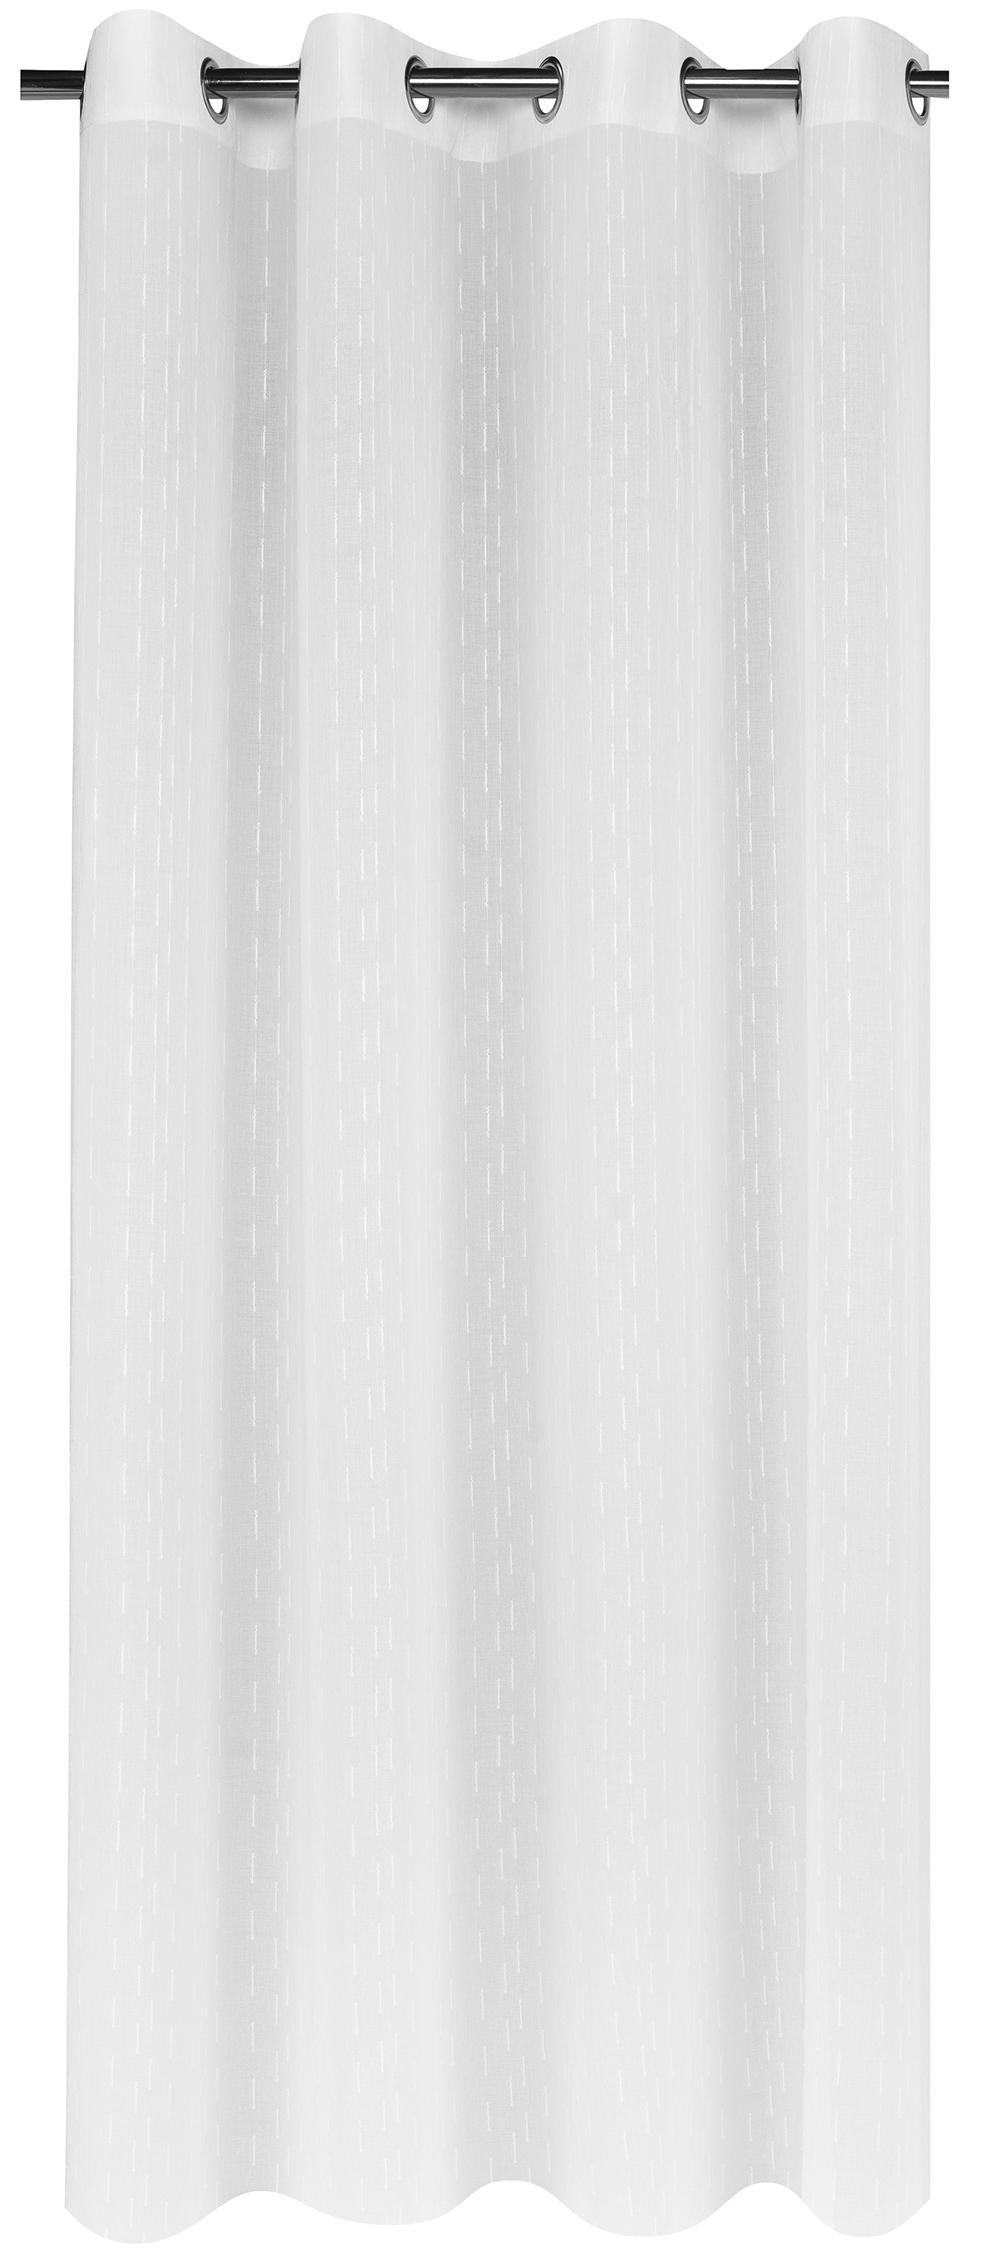 voilage jacquard avec motifs b tonnets blanc beige taupe gris chocolat violet. Black Bedroom Furniture Sets. Home Design Ideas